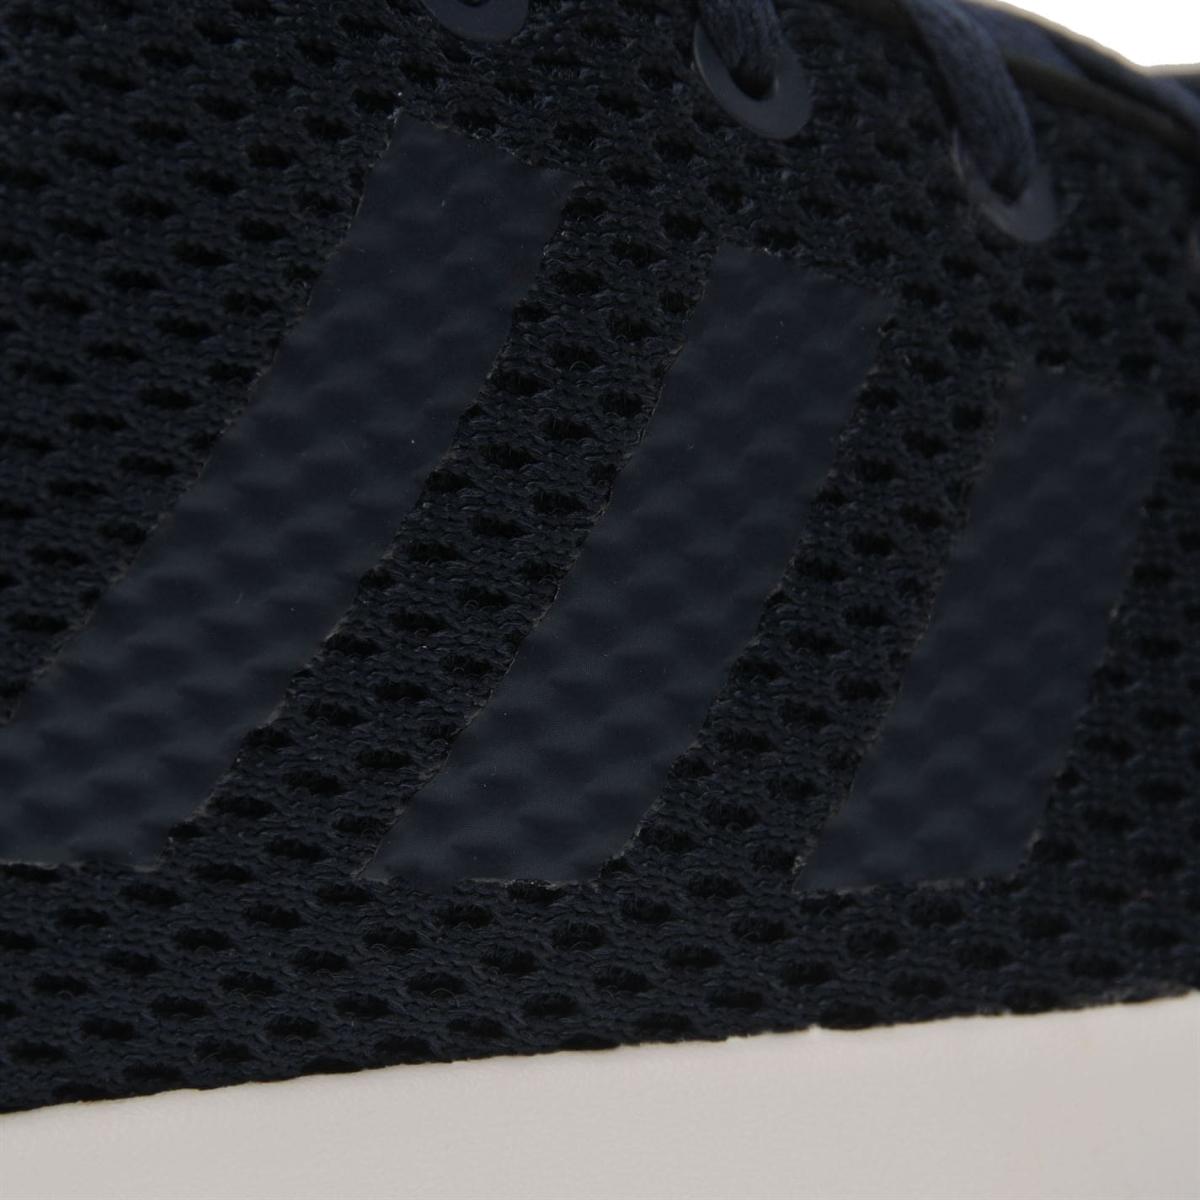 adidas Cloudfoam Racer Herren Turnschuhe Sportschuhe